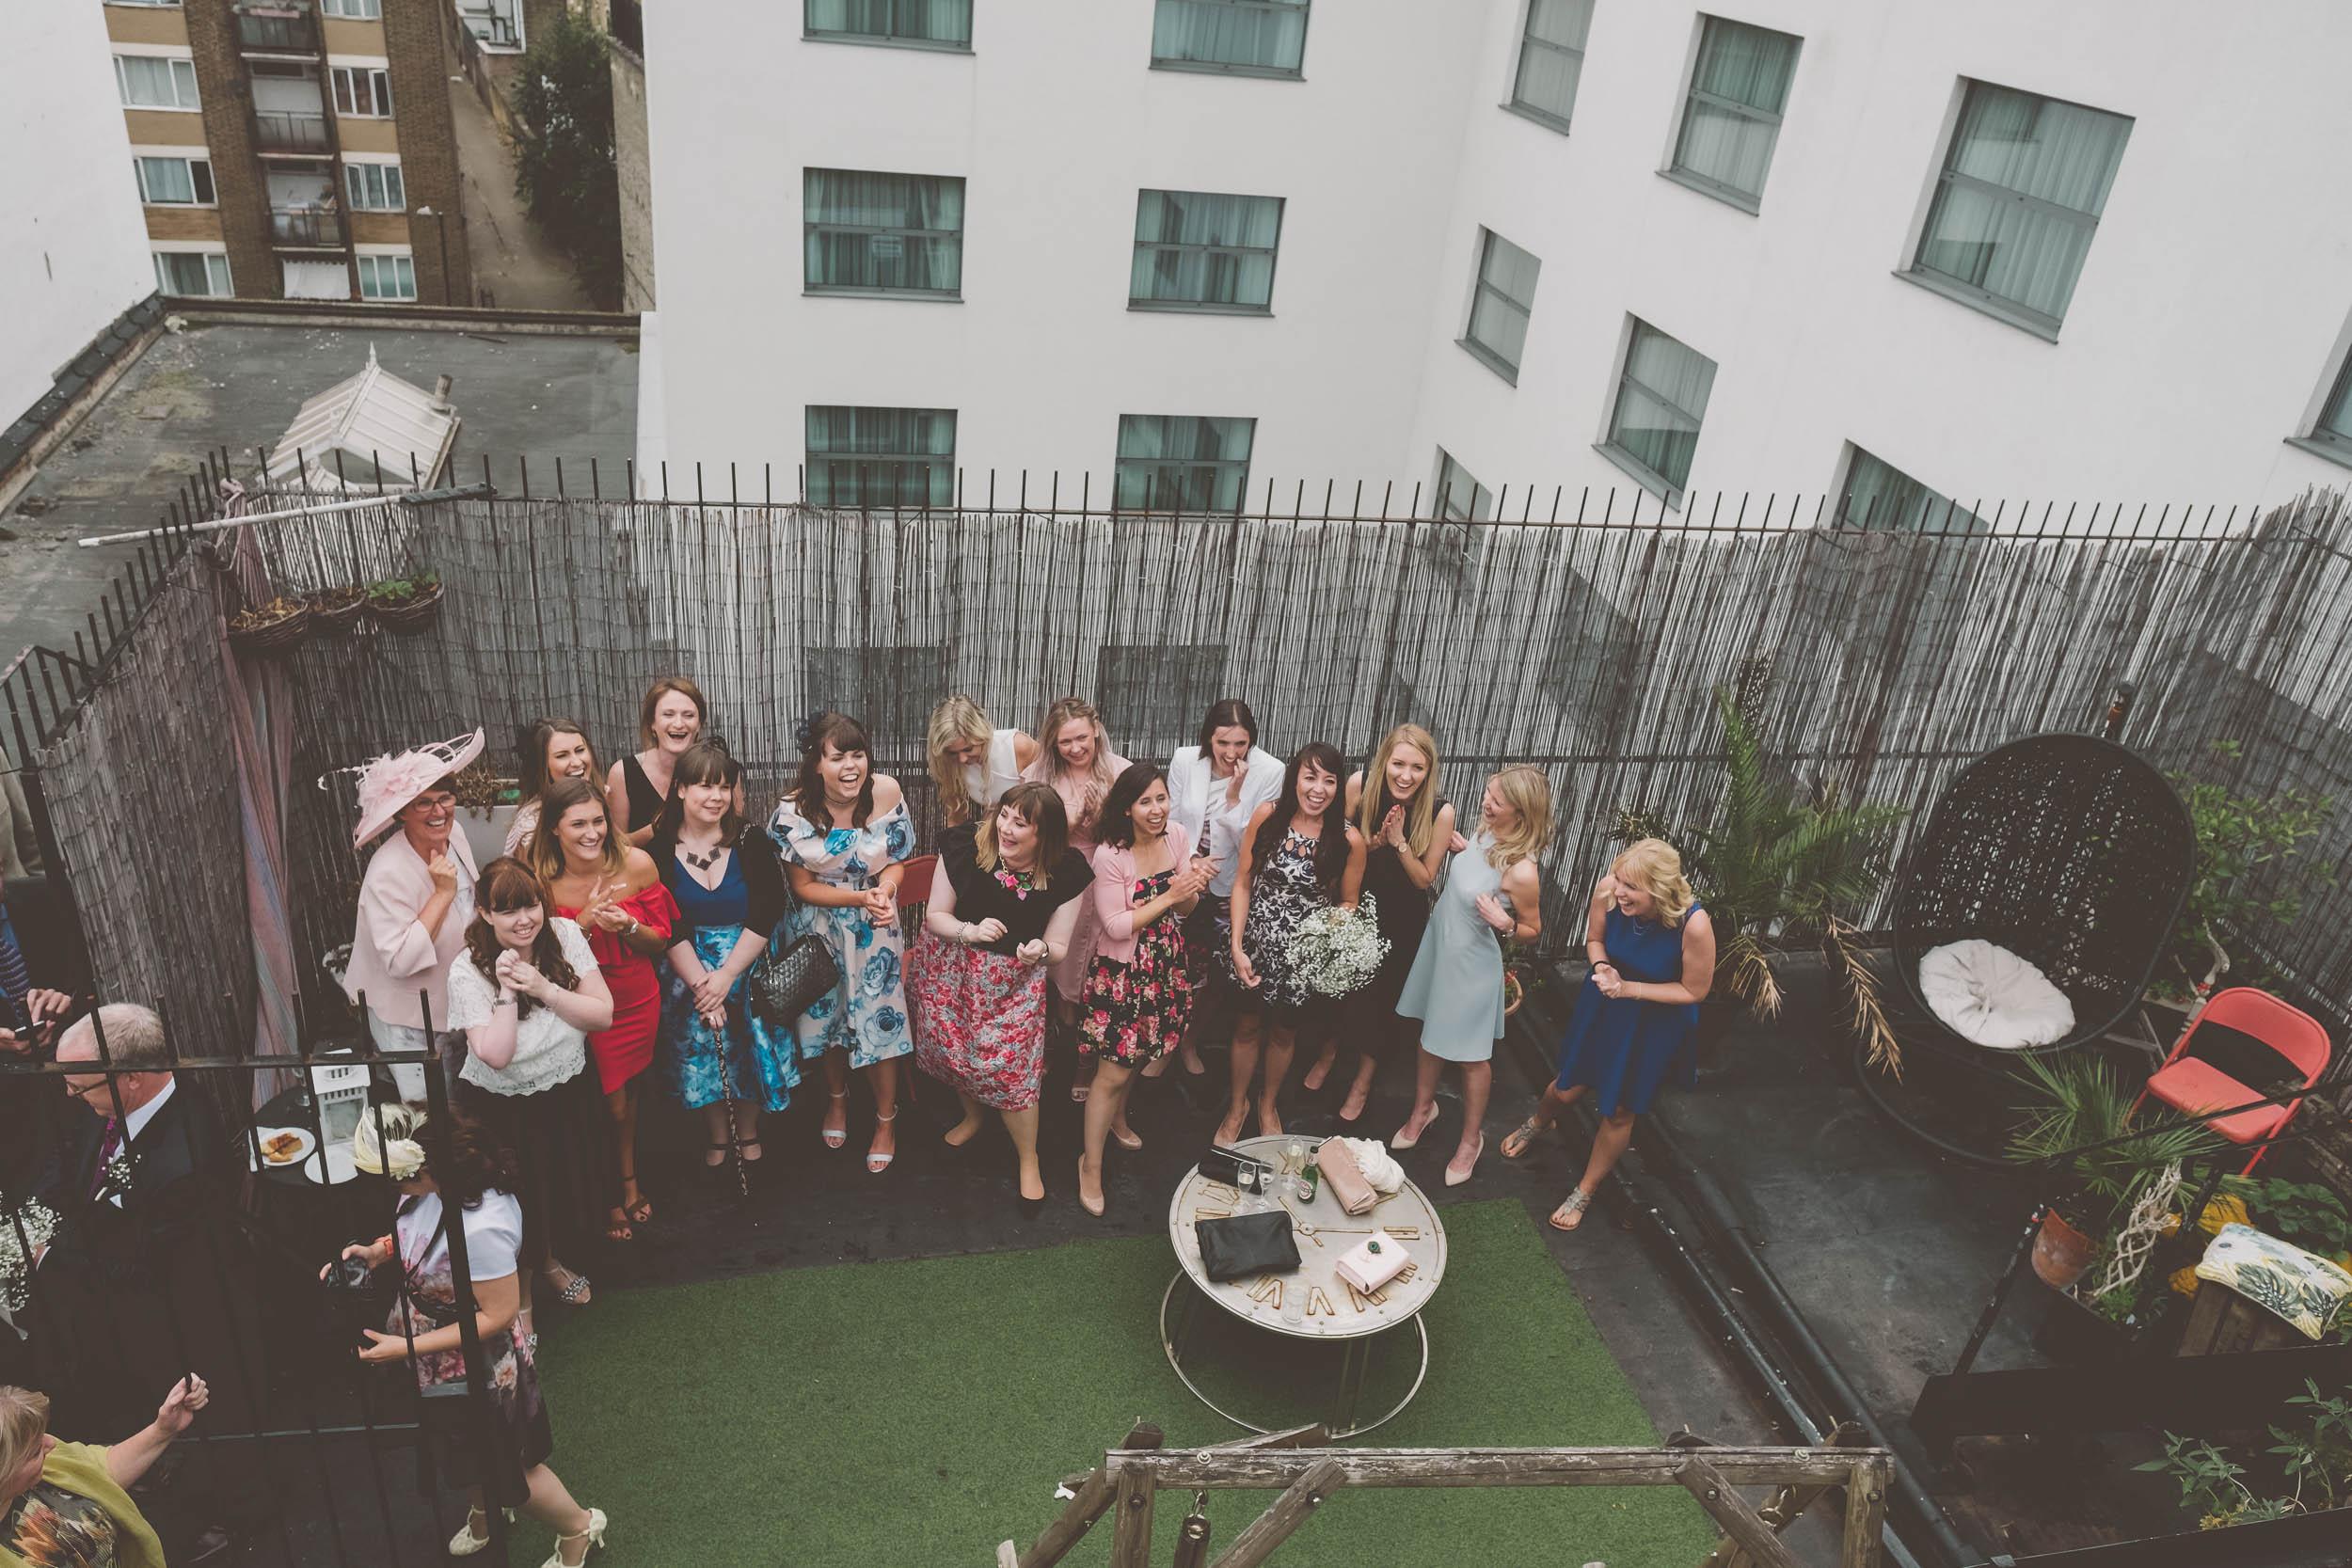 islington-town-hall-4th-floor-studios-wedding274.jpg